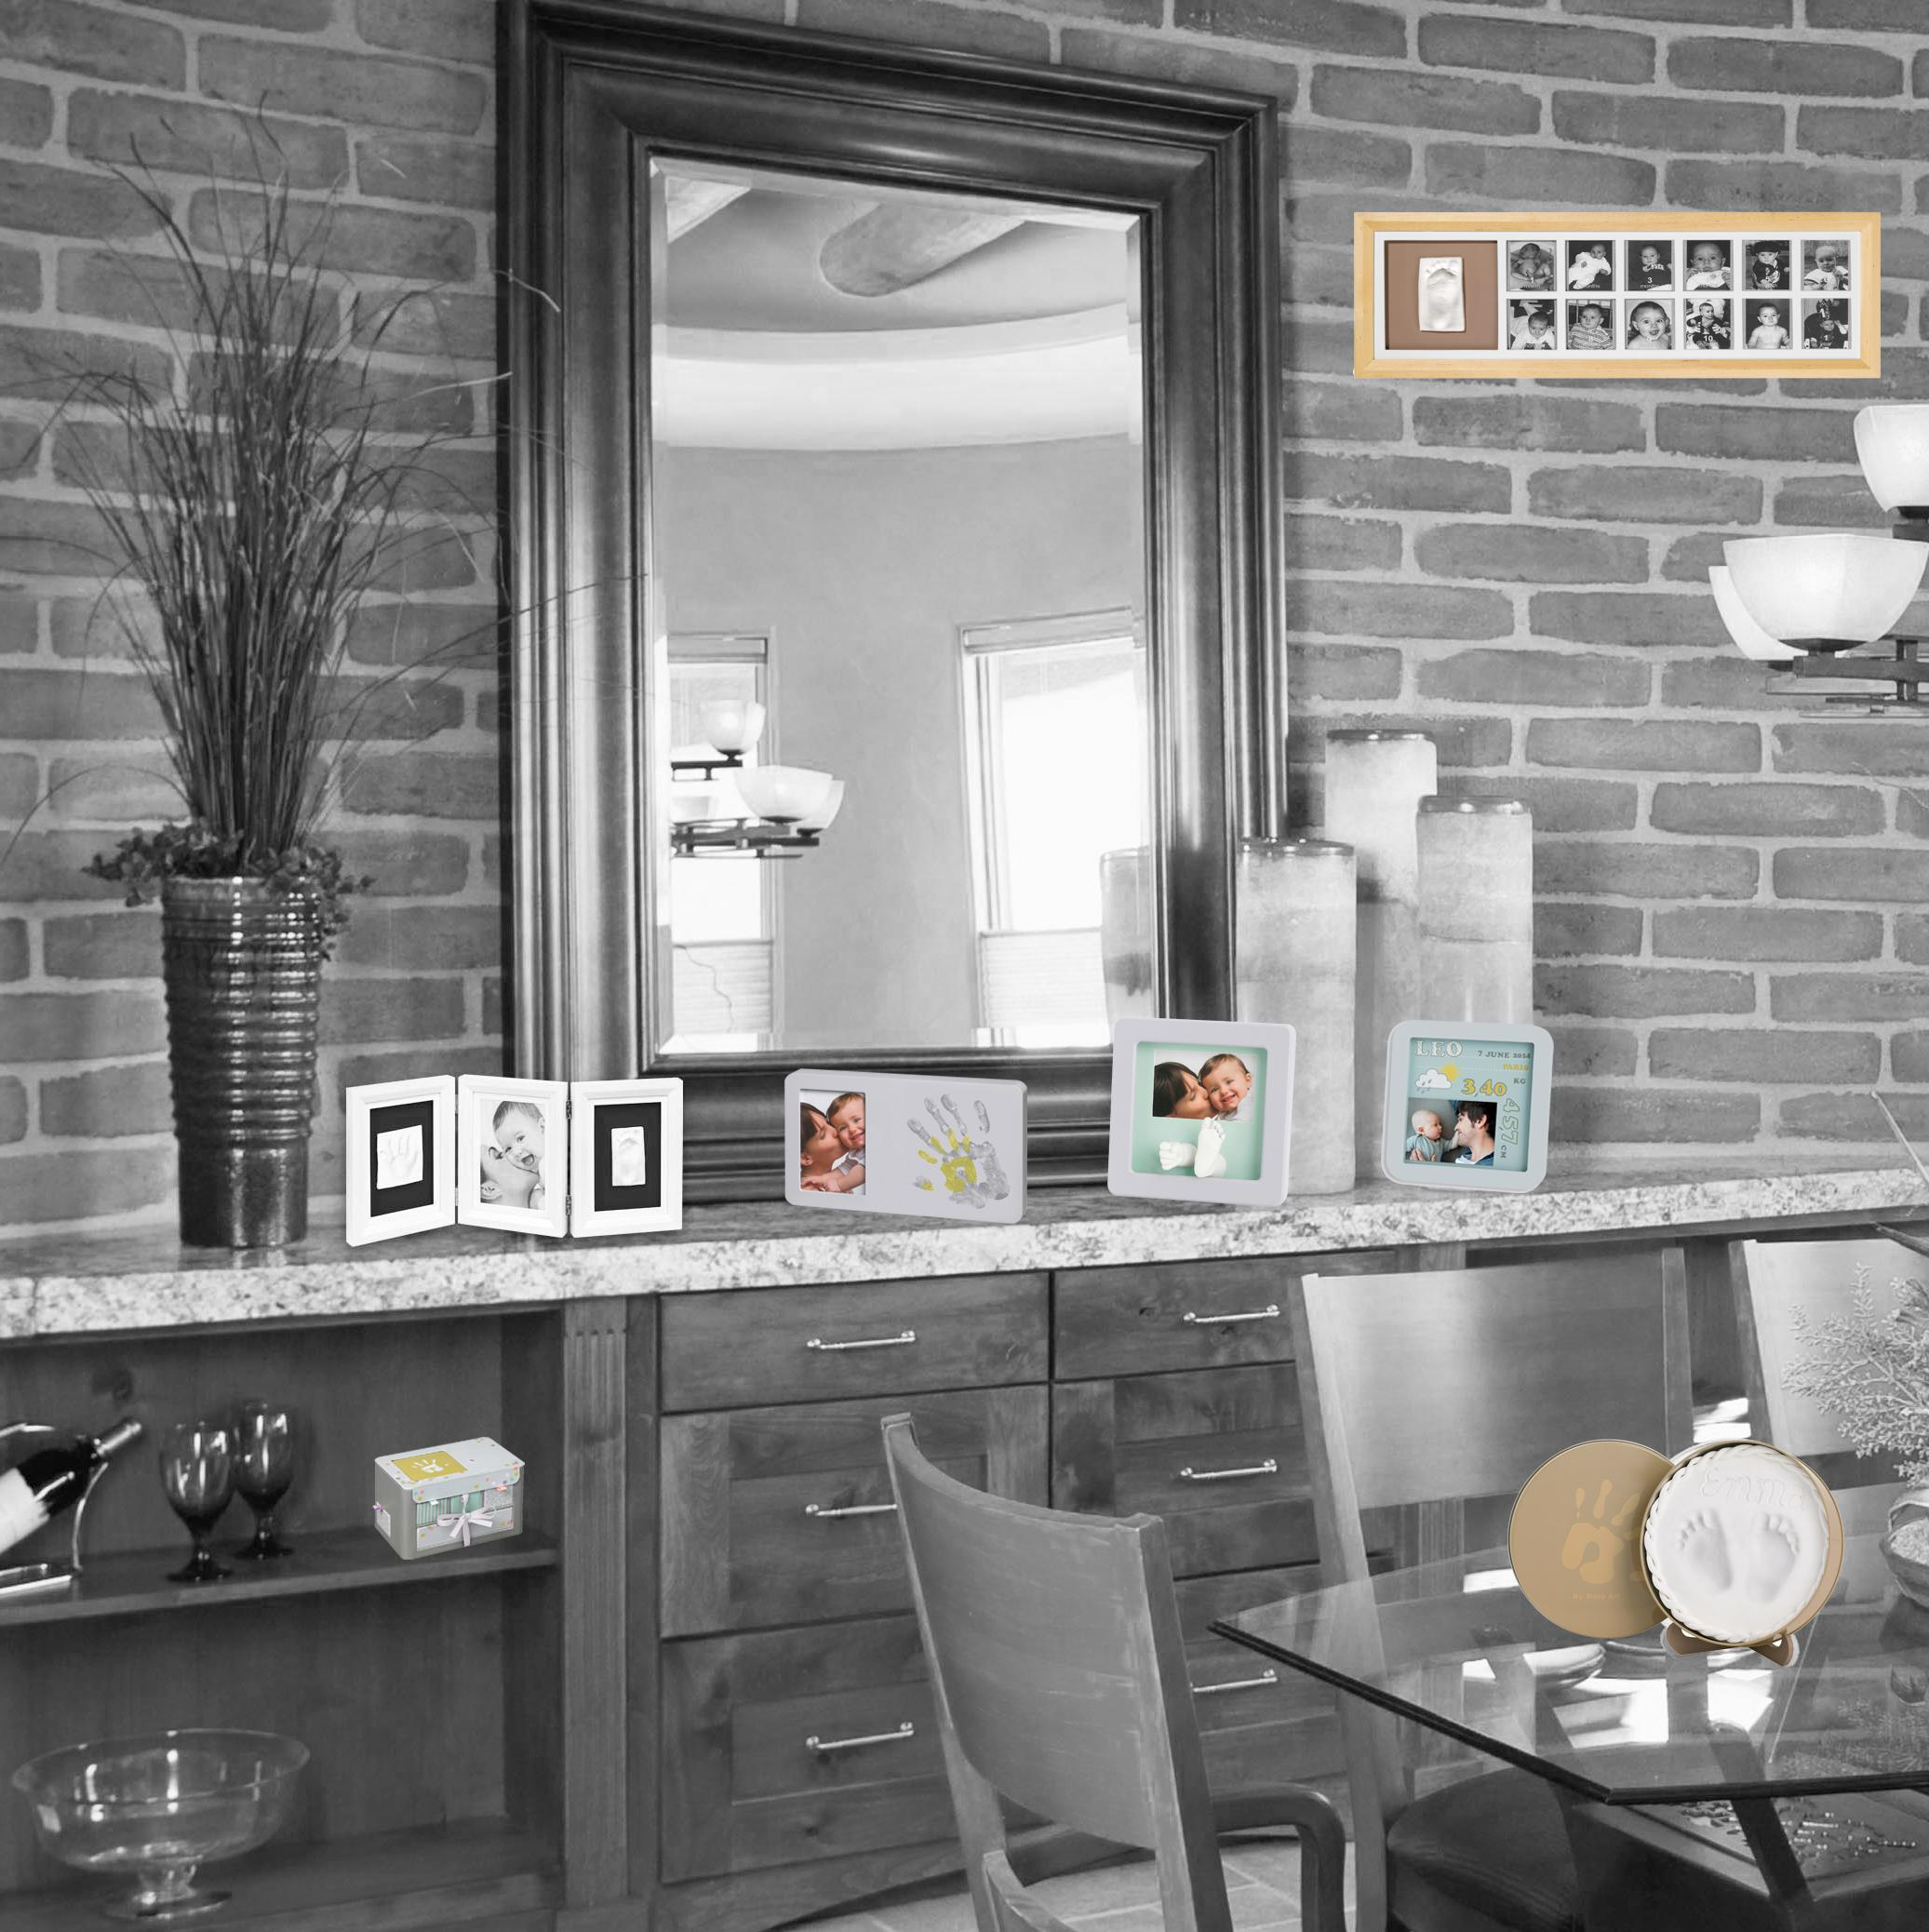 anleitung bilderrahmen aufh ngen b cher bei. Black Bedroom Furniture Sets. Home Design Ideas